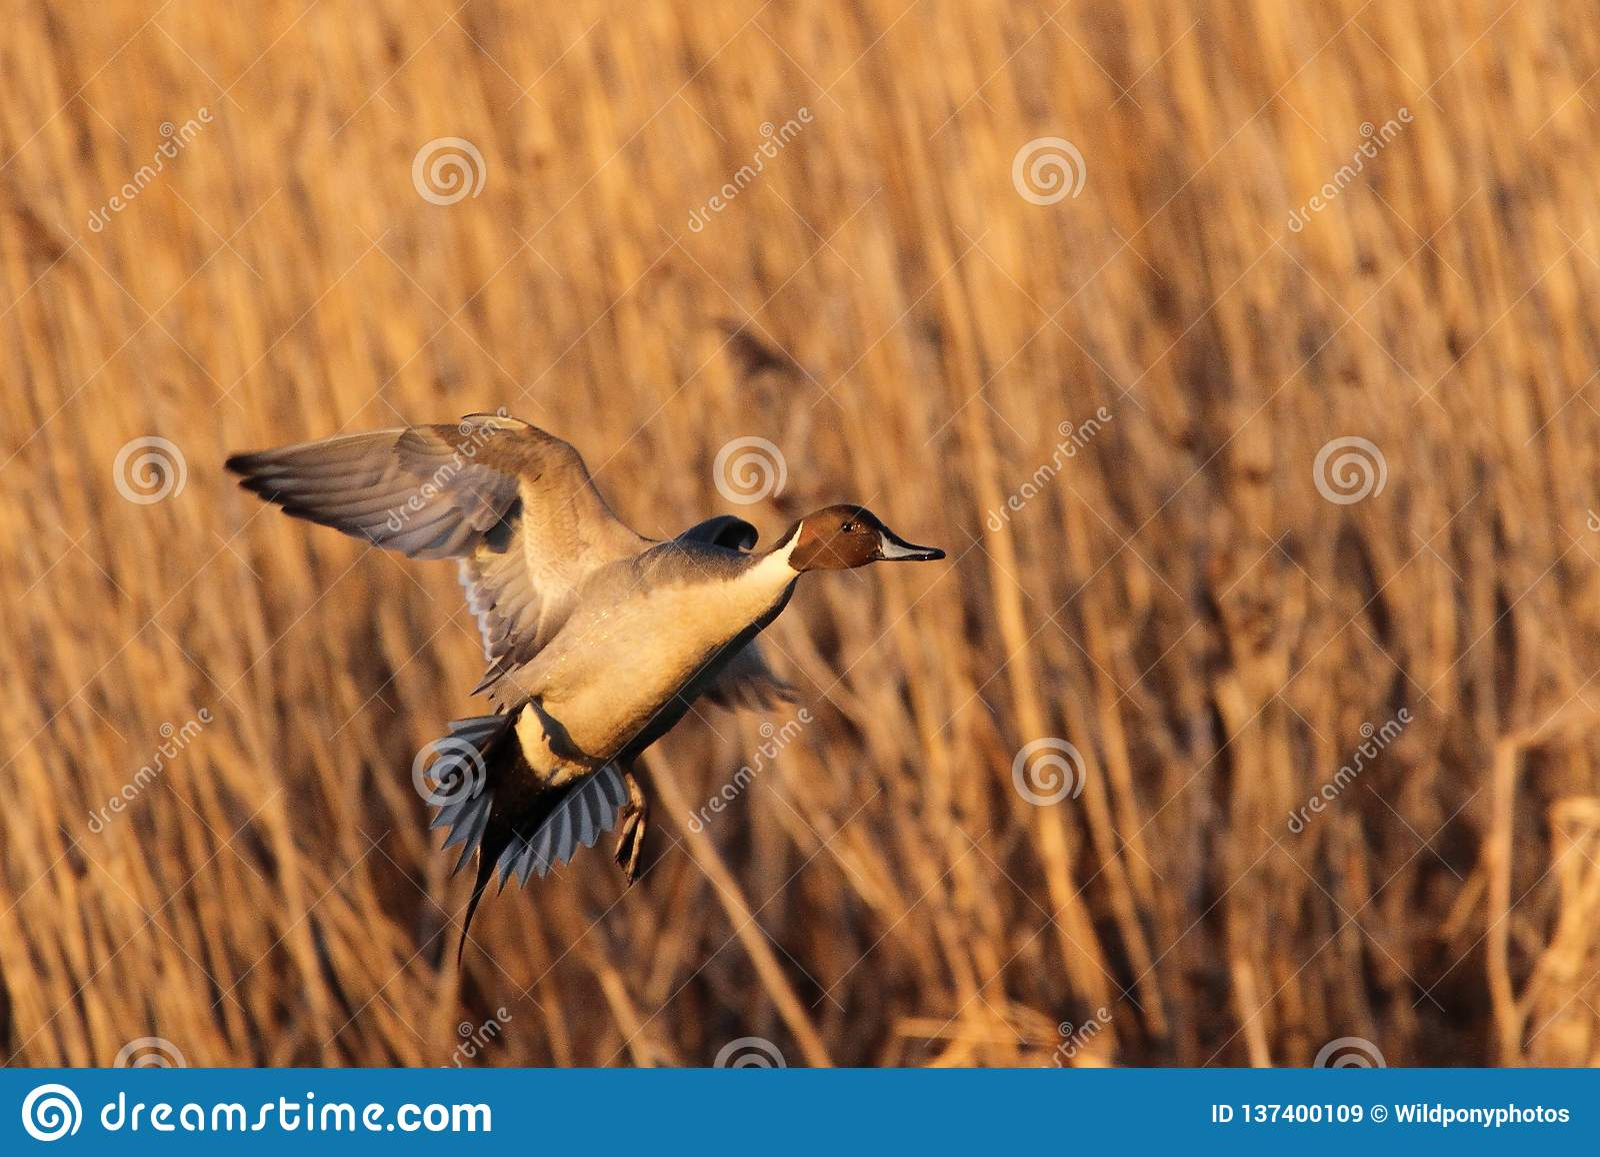 Pintail Drake Coming in for a Landing